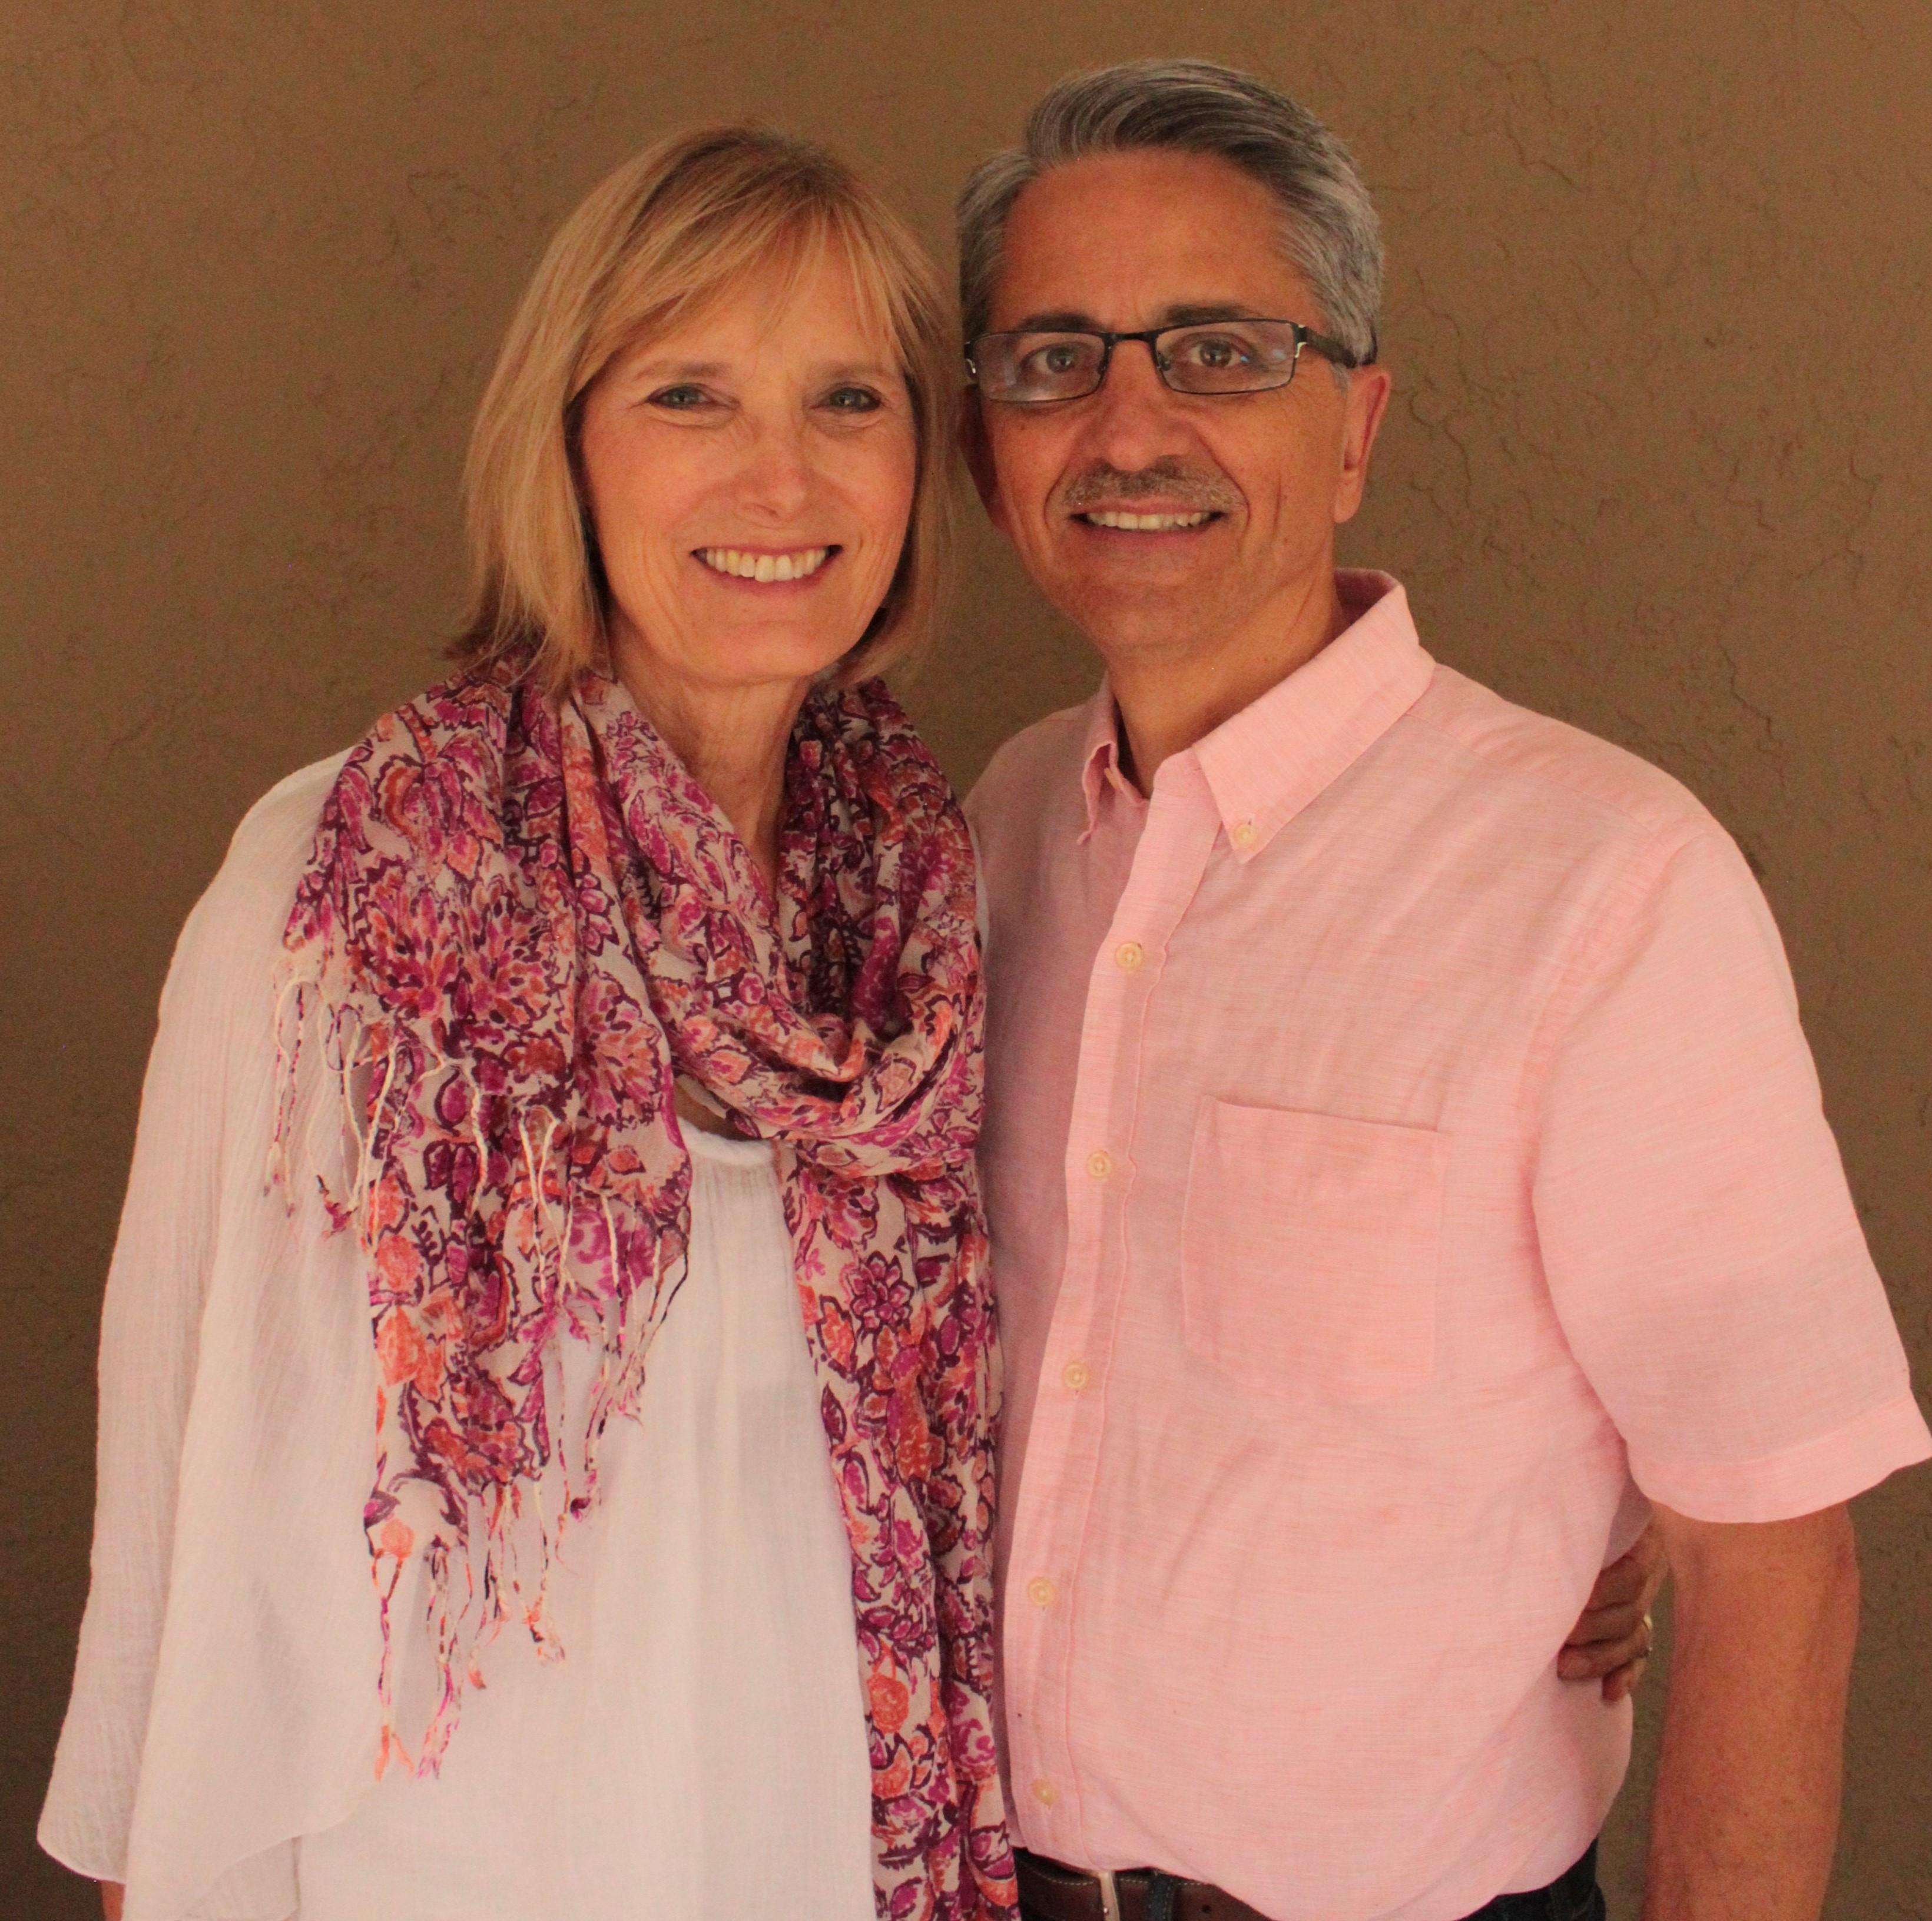 Dan and Cathy Groff